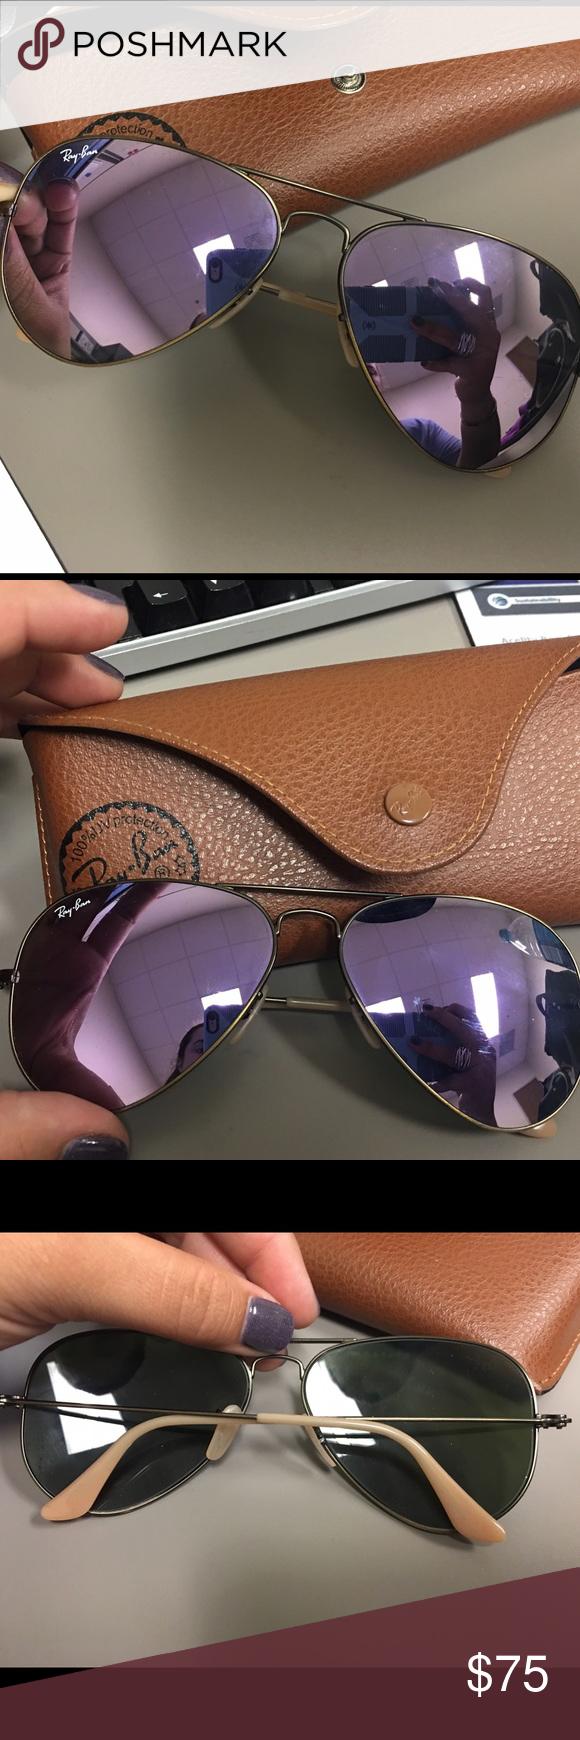 3165080ab3434 Rayban Aviator Sunglasses hardly worn rayban lilac mirror aviator sunglasses.  I love them